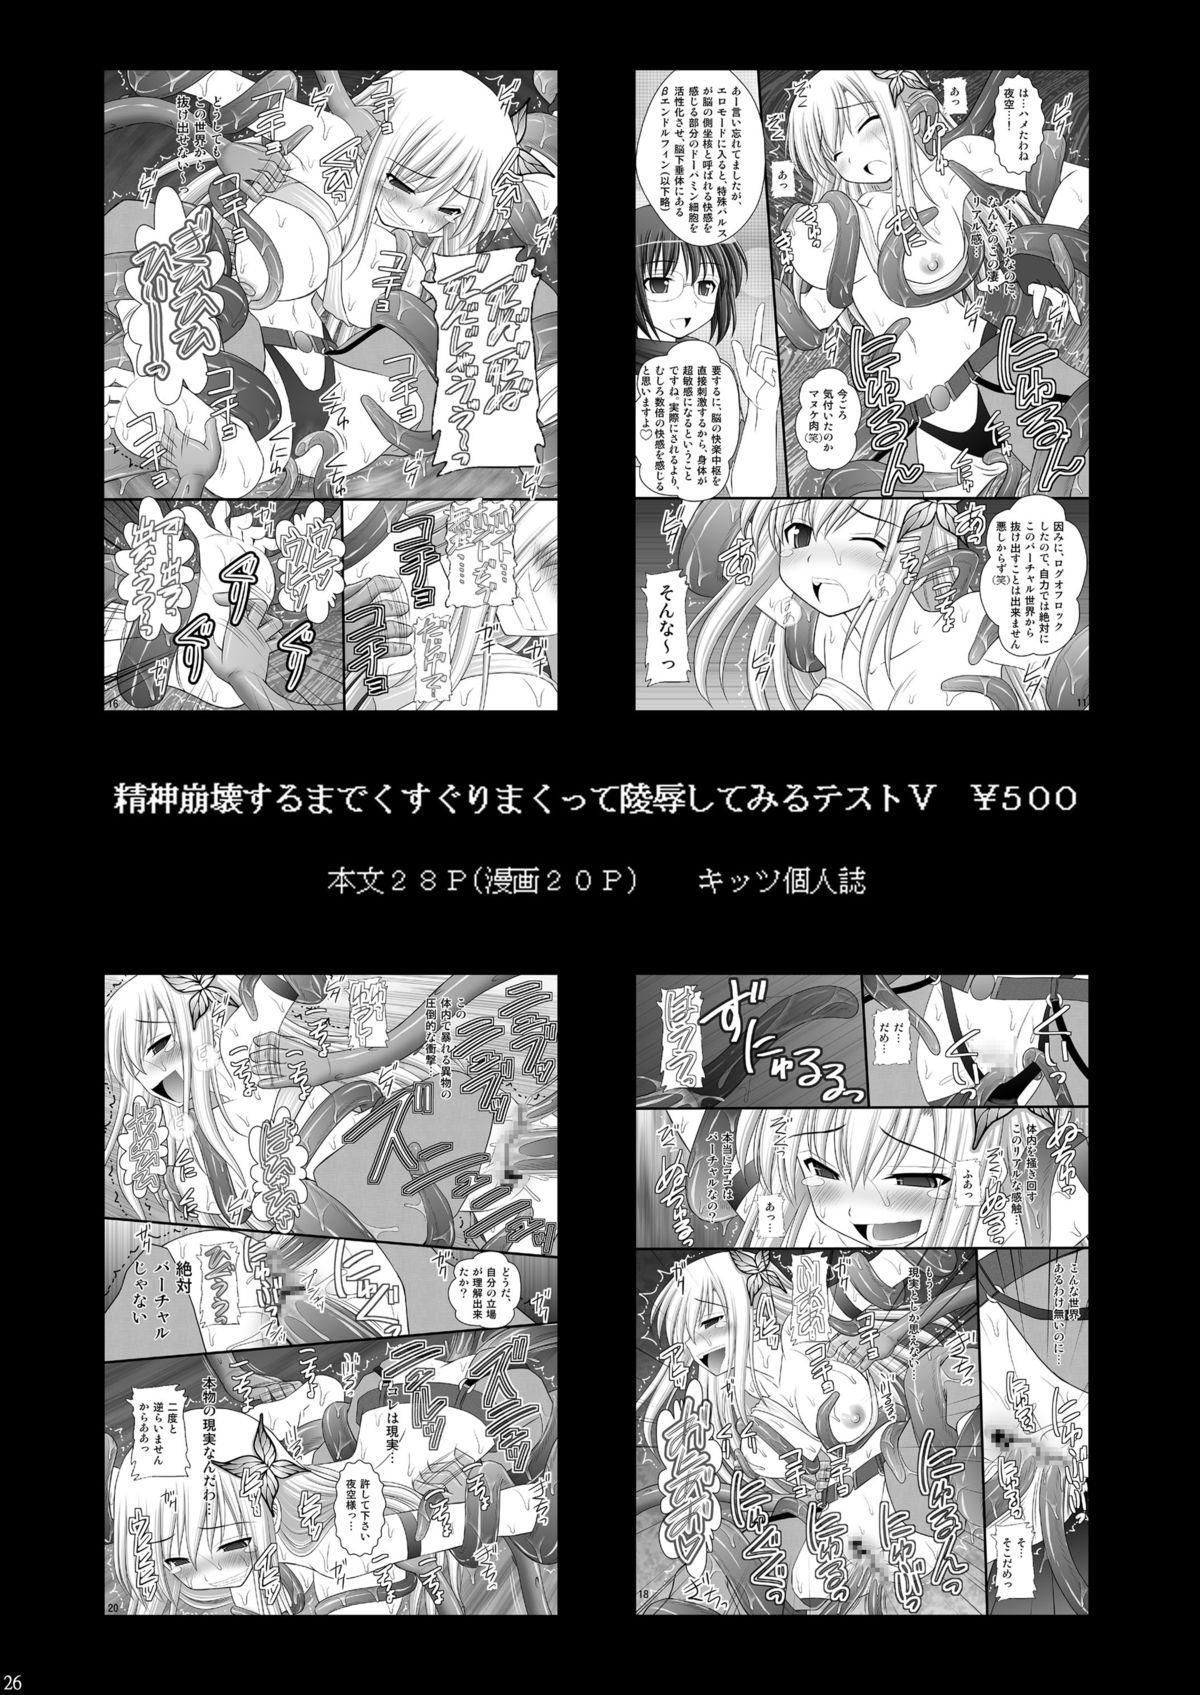 Toraware Hime I - System Master | Hostage Princess I 24